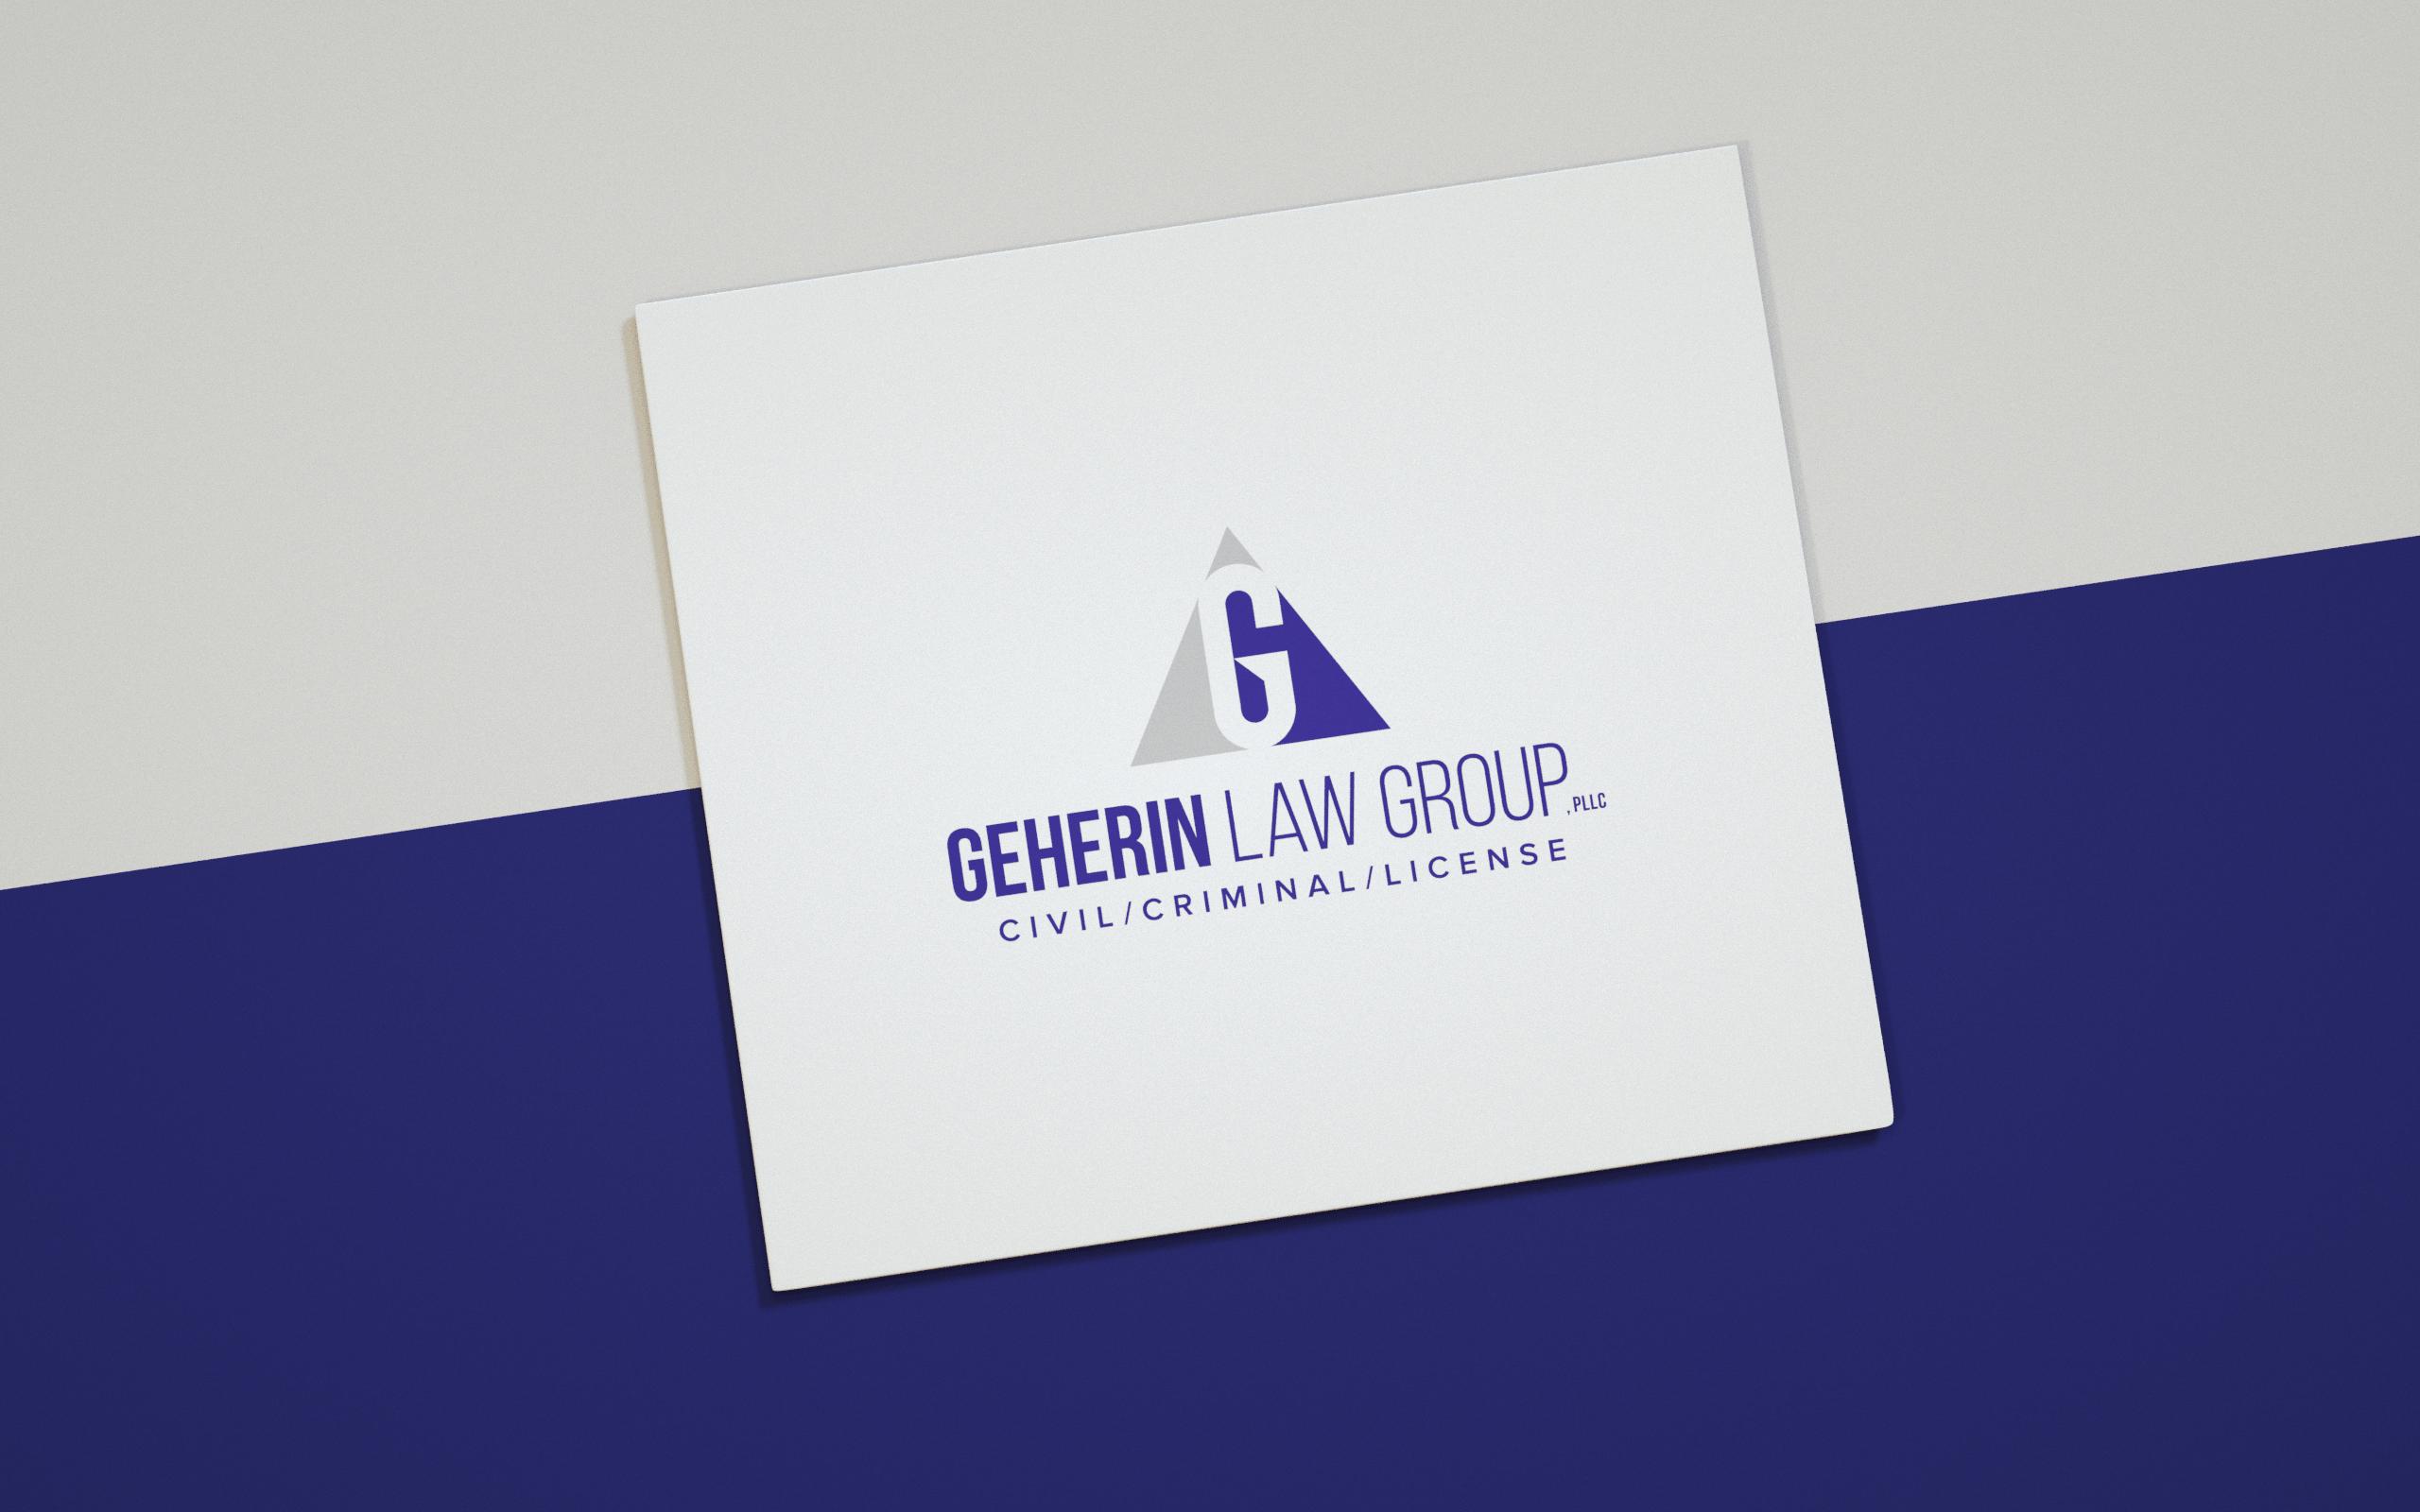 GEHERIN LAW GROUP LOGO